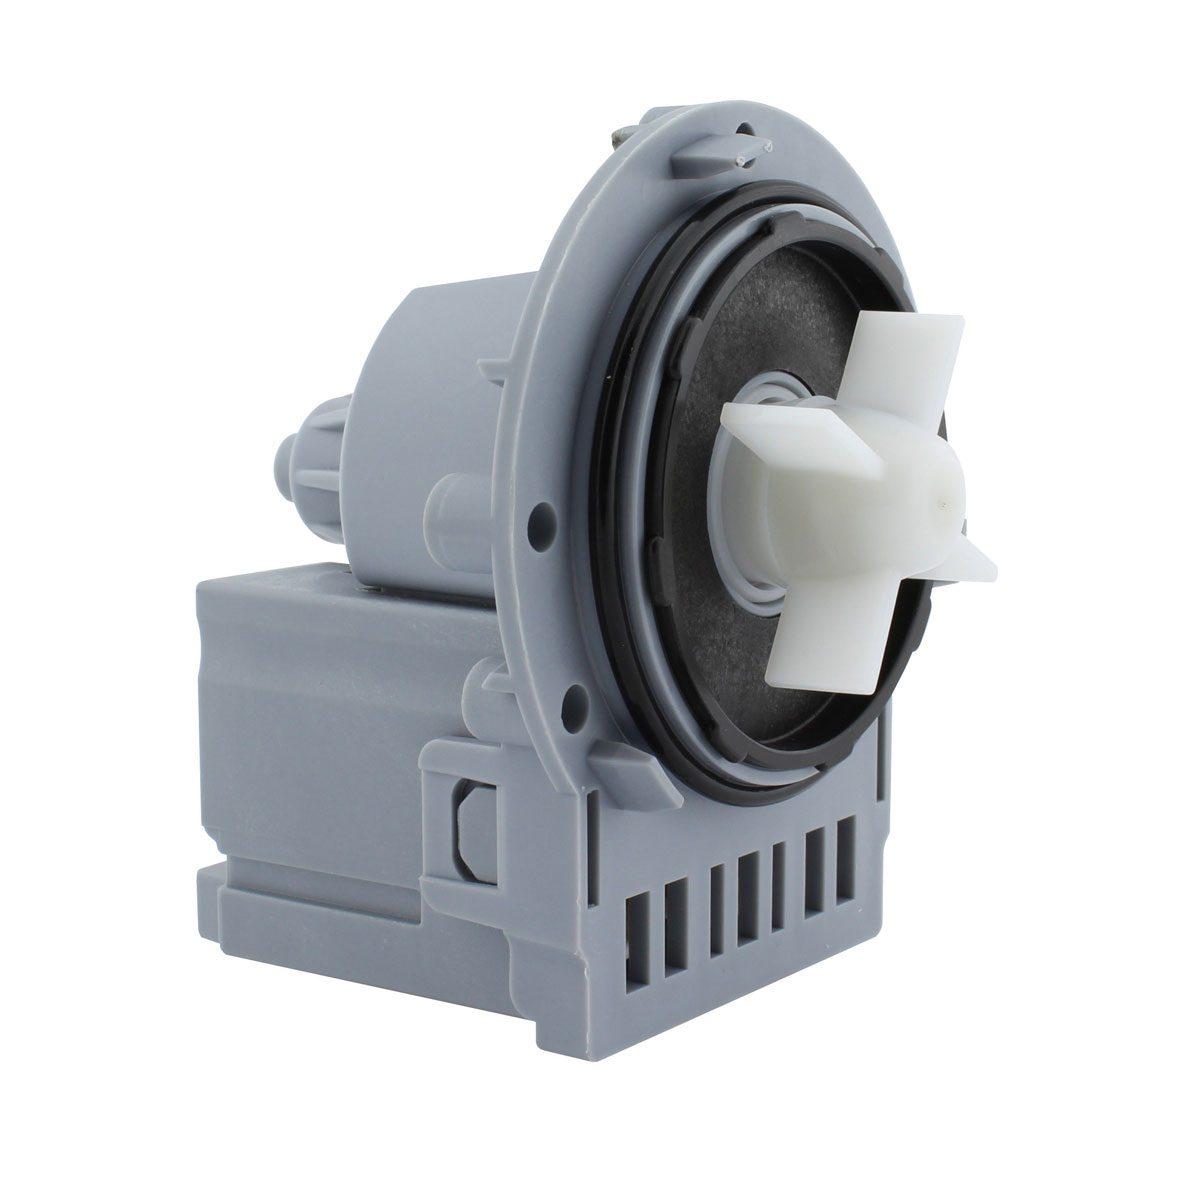 Washing machine pump